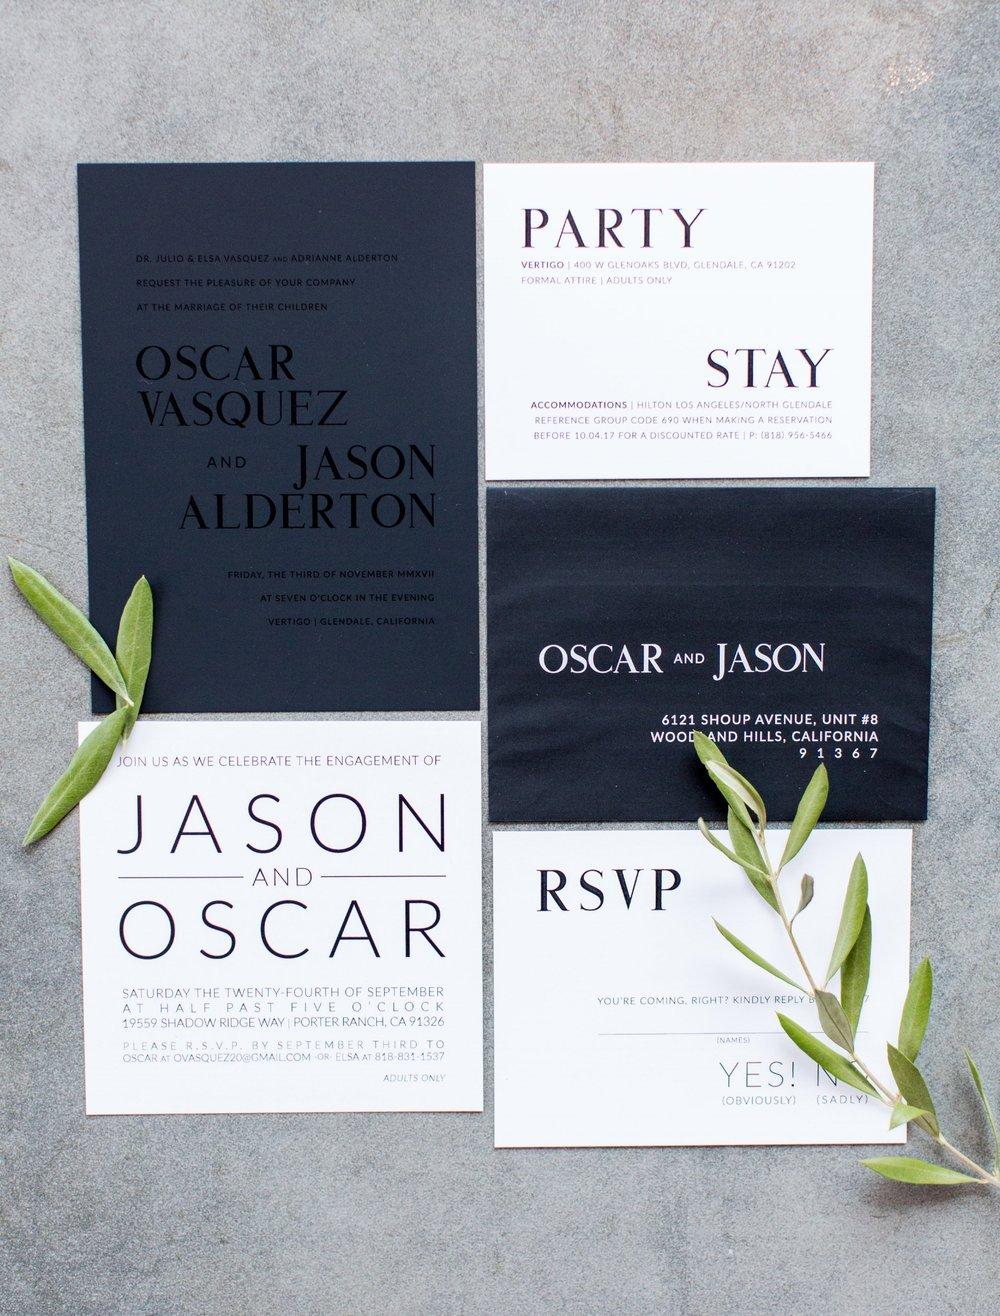 OSCAR & JASON